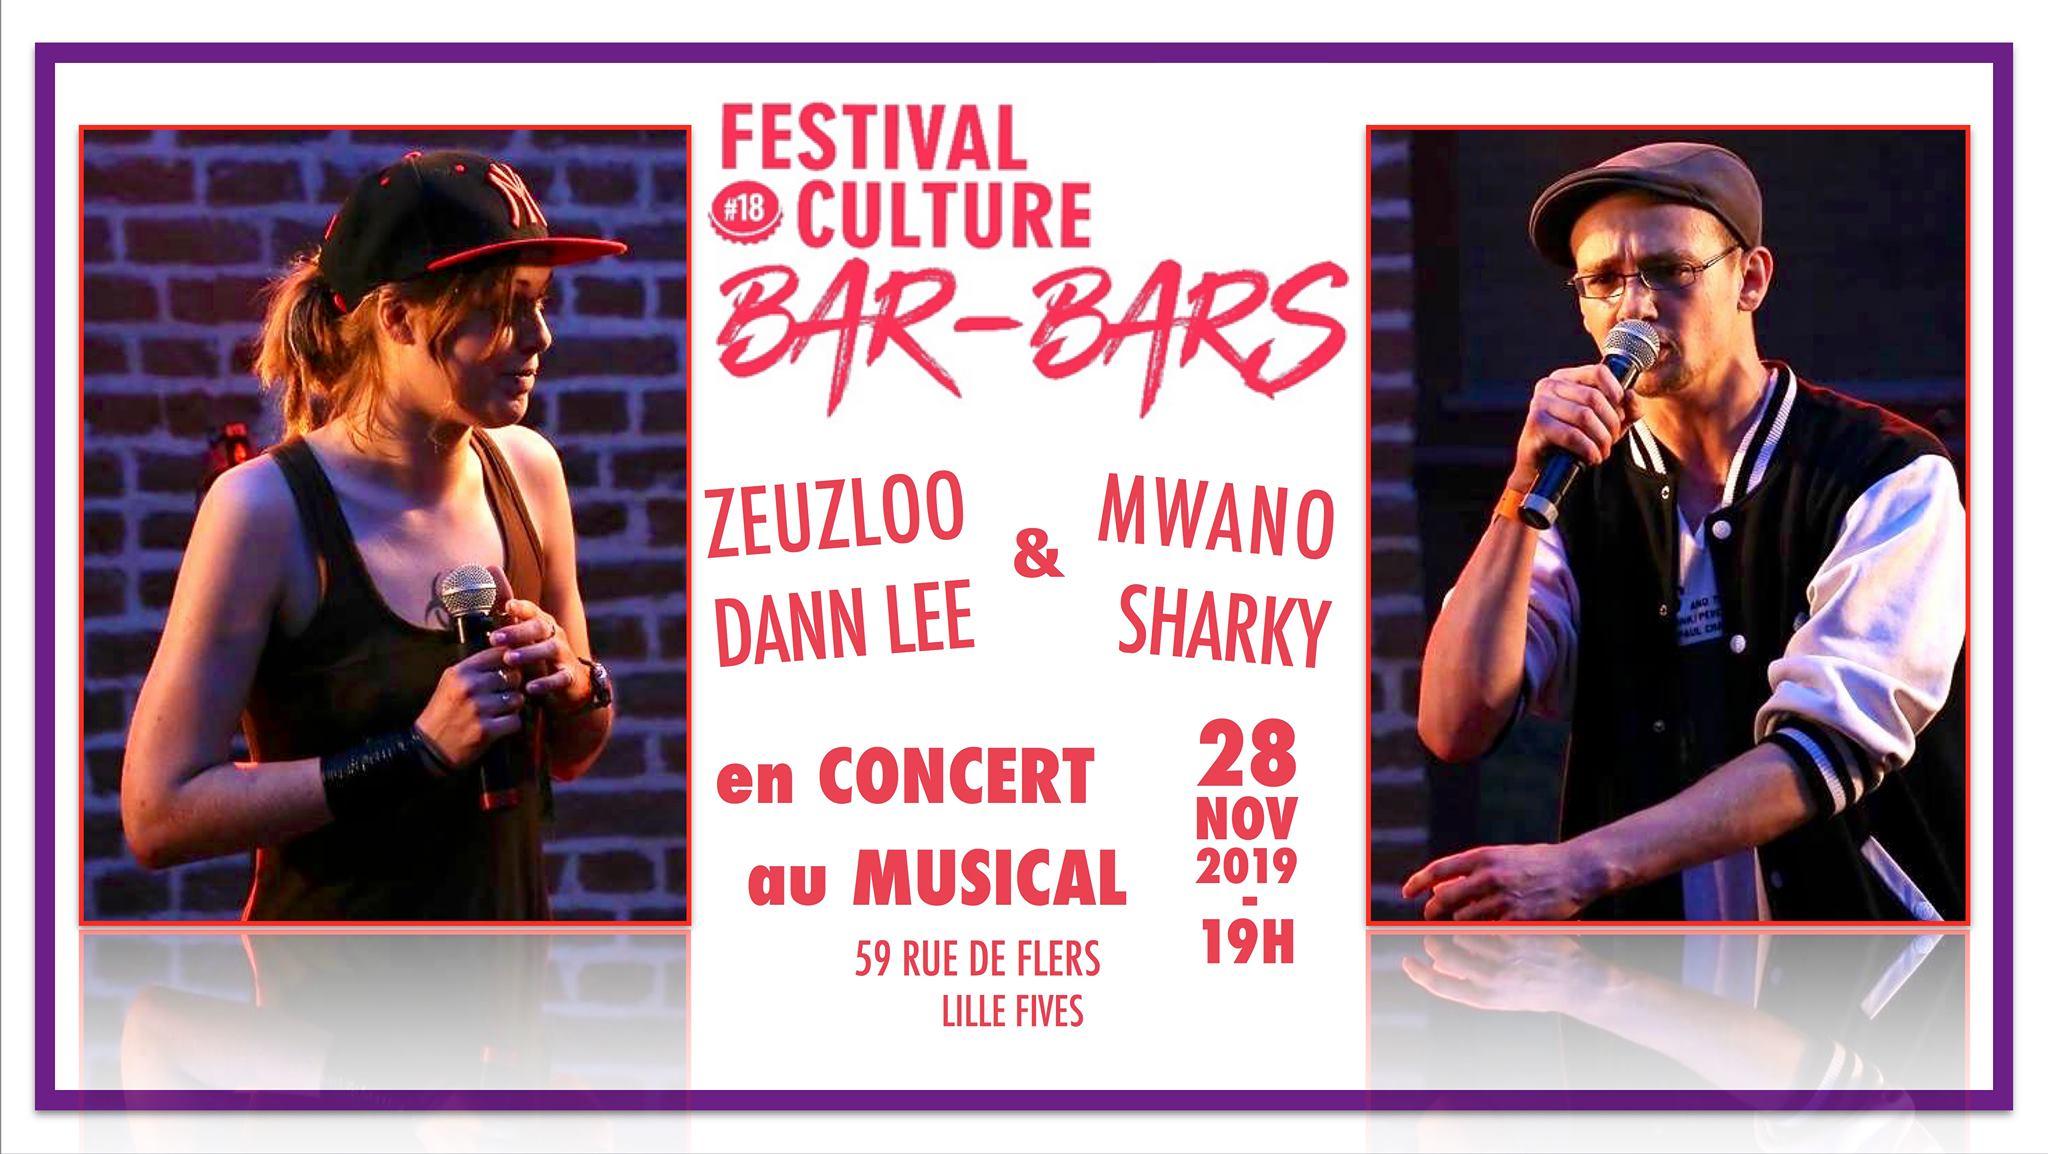 Festival Culture Bar-Bars au Musical